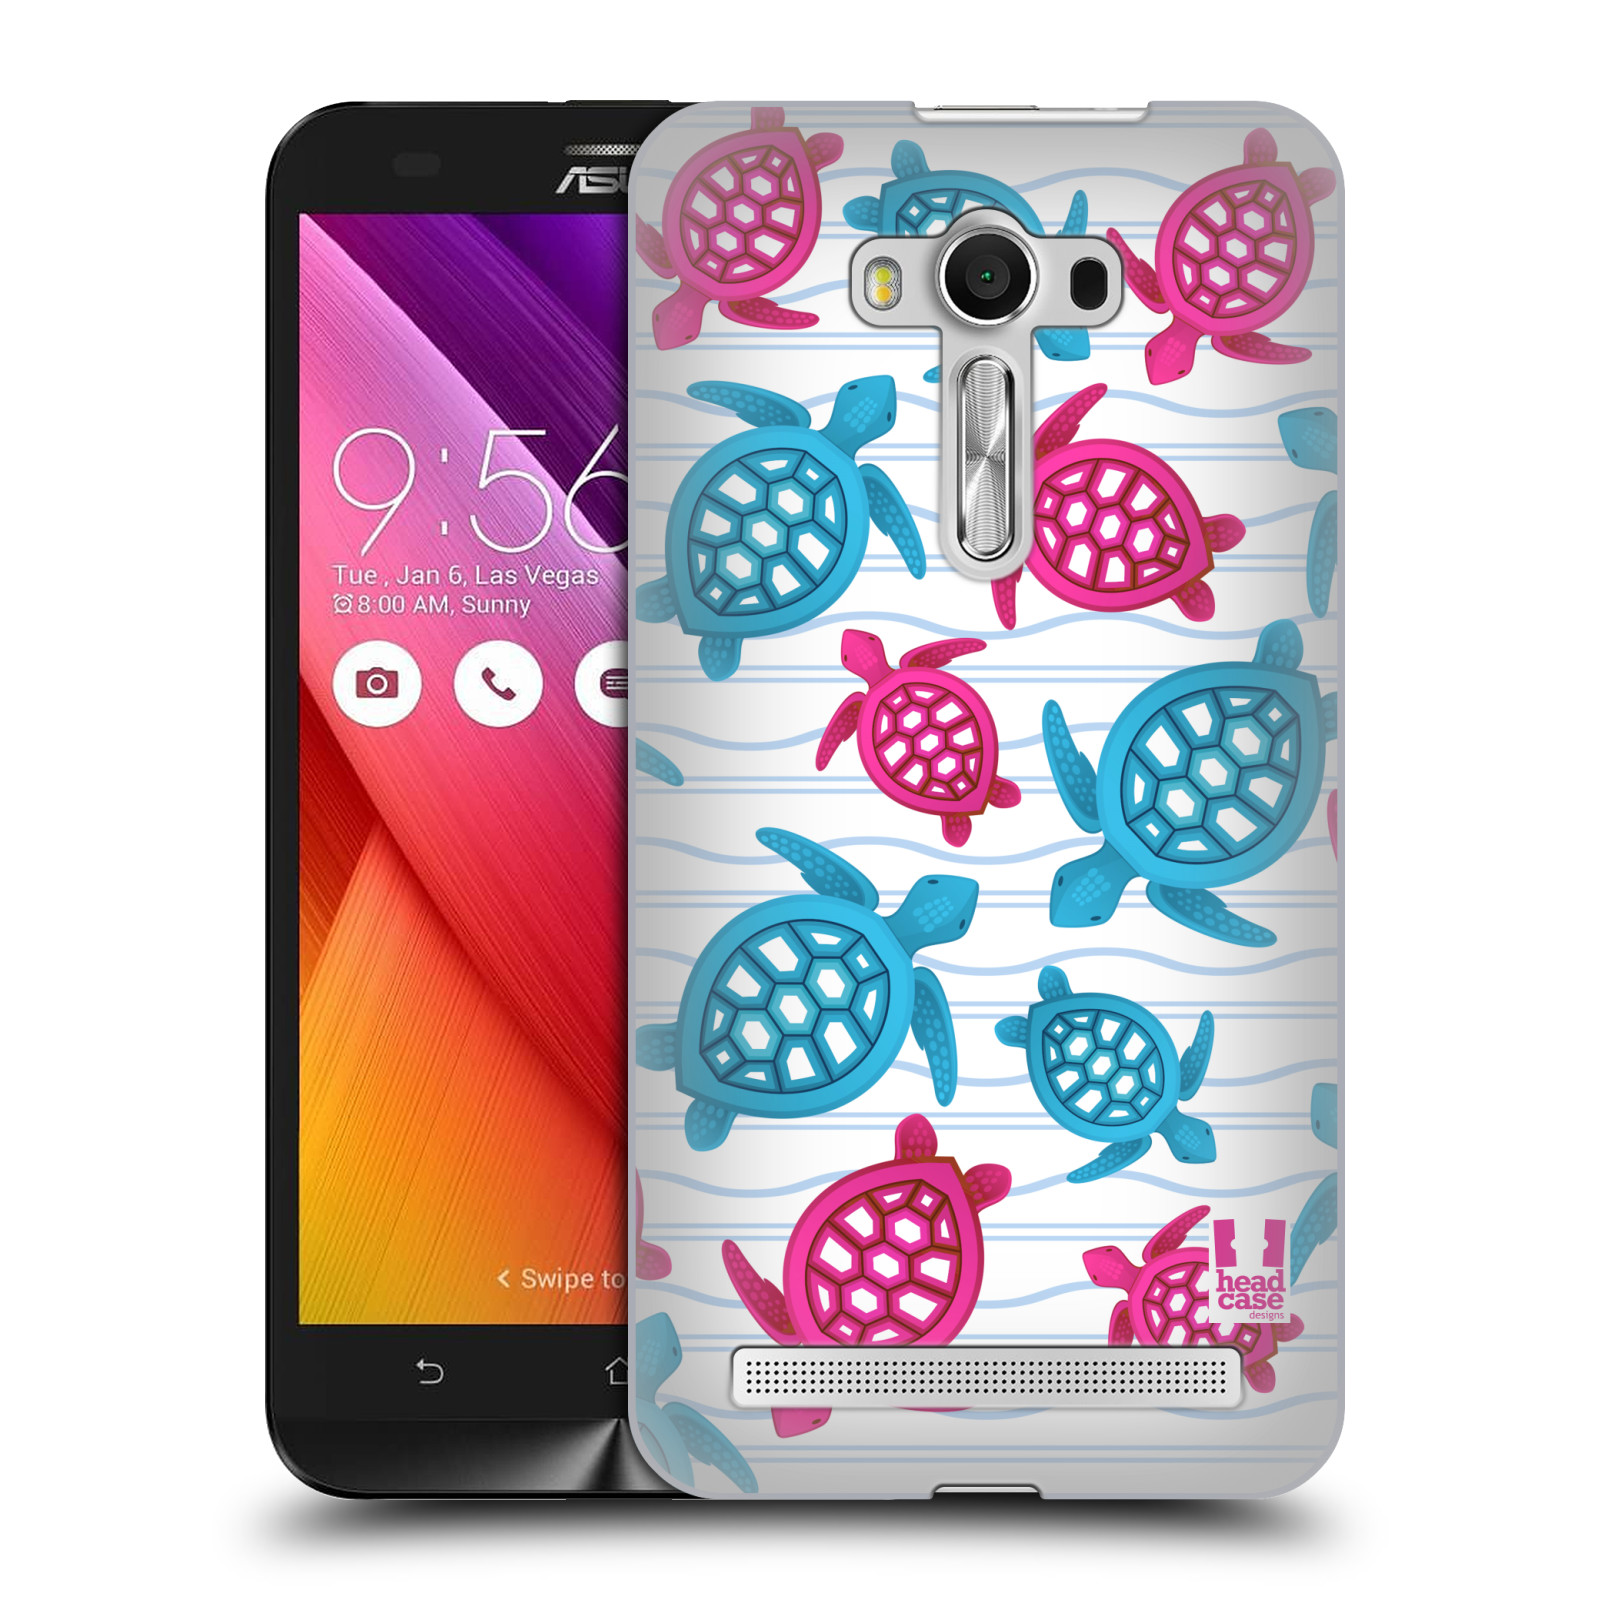 HEAD CASE plastový obal na mobil Asus Zenfone 2 LASER (5,5 displej ZE550KL) vzor mořský živočich želva modrá a růžová